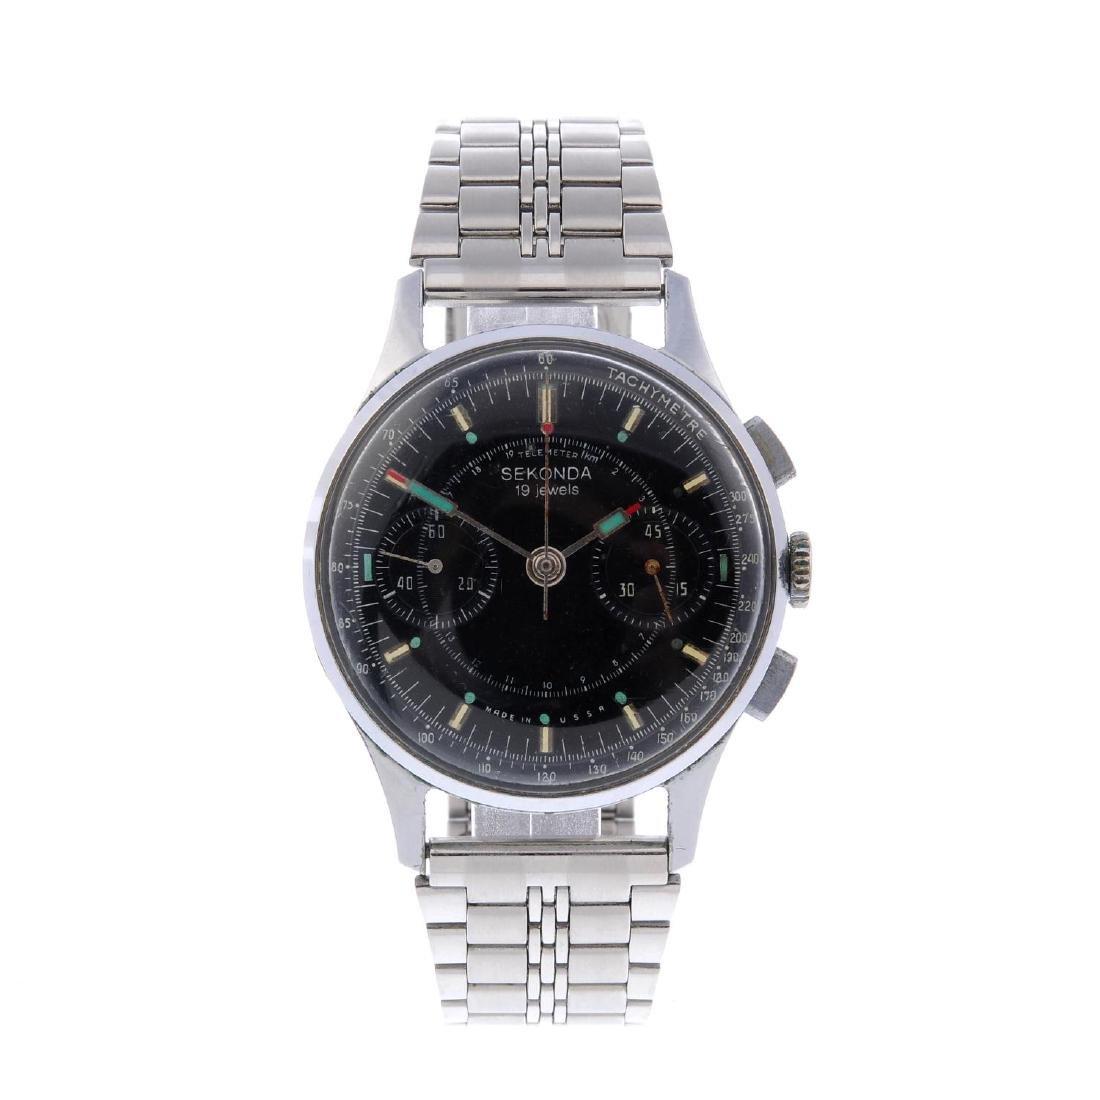 SEKONDA - a gentleman's chronograph bracelet watch.